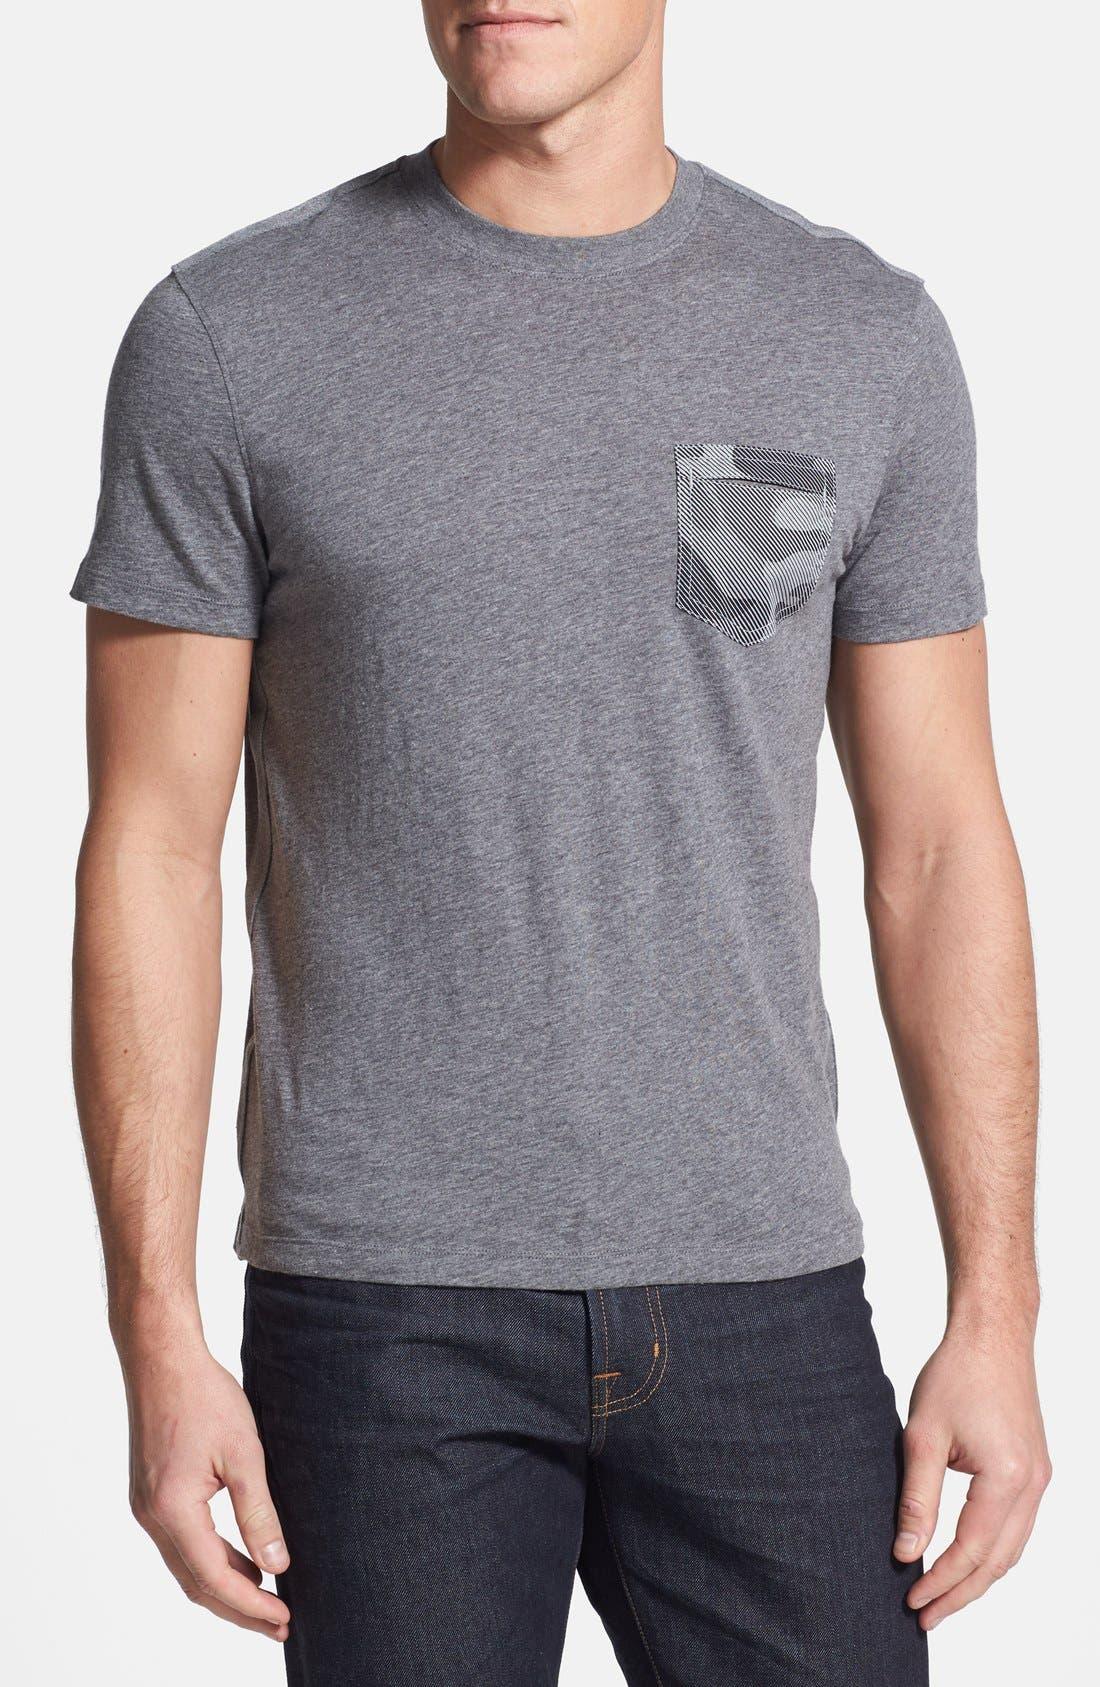 Alternate Image 1 Selected - Michael Kors Camo Pocket Slub T-Shirt